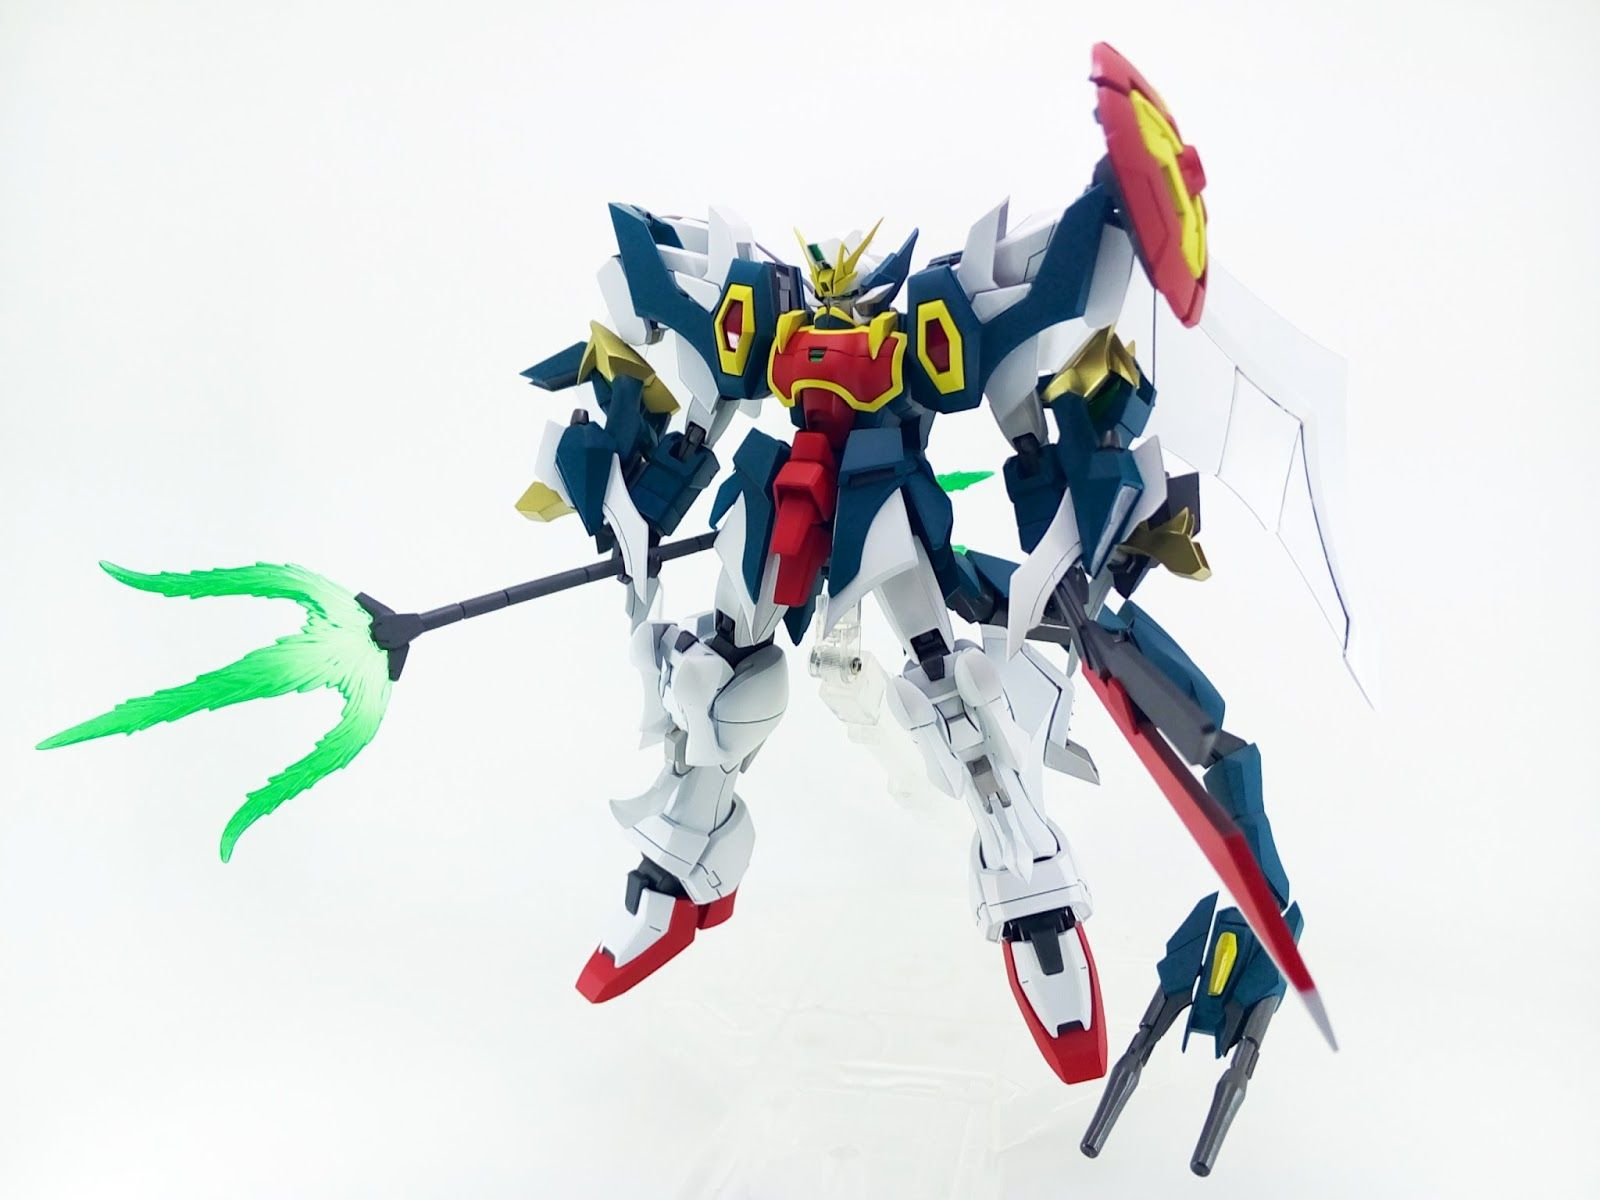 Robot Spirits Mobile Suit Gundam Wing Altron Gundam Action Figur... FROM JAPAN